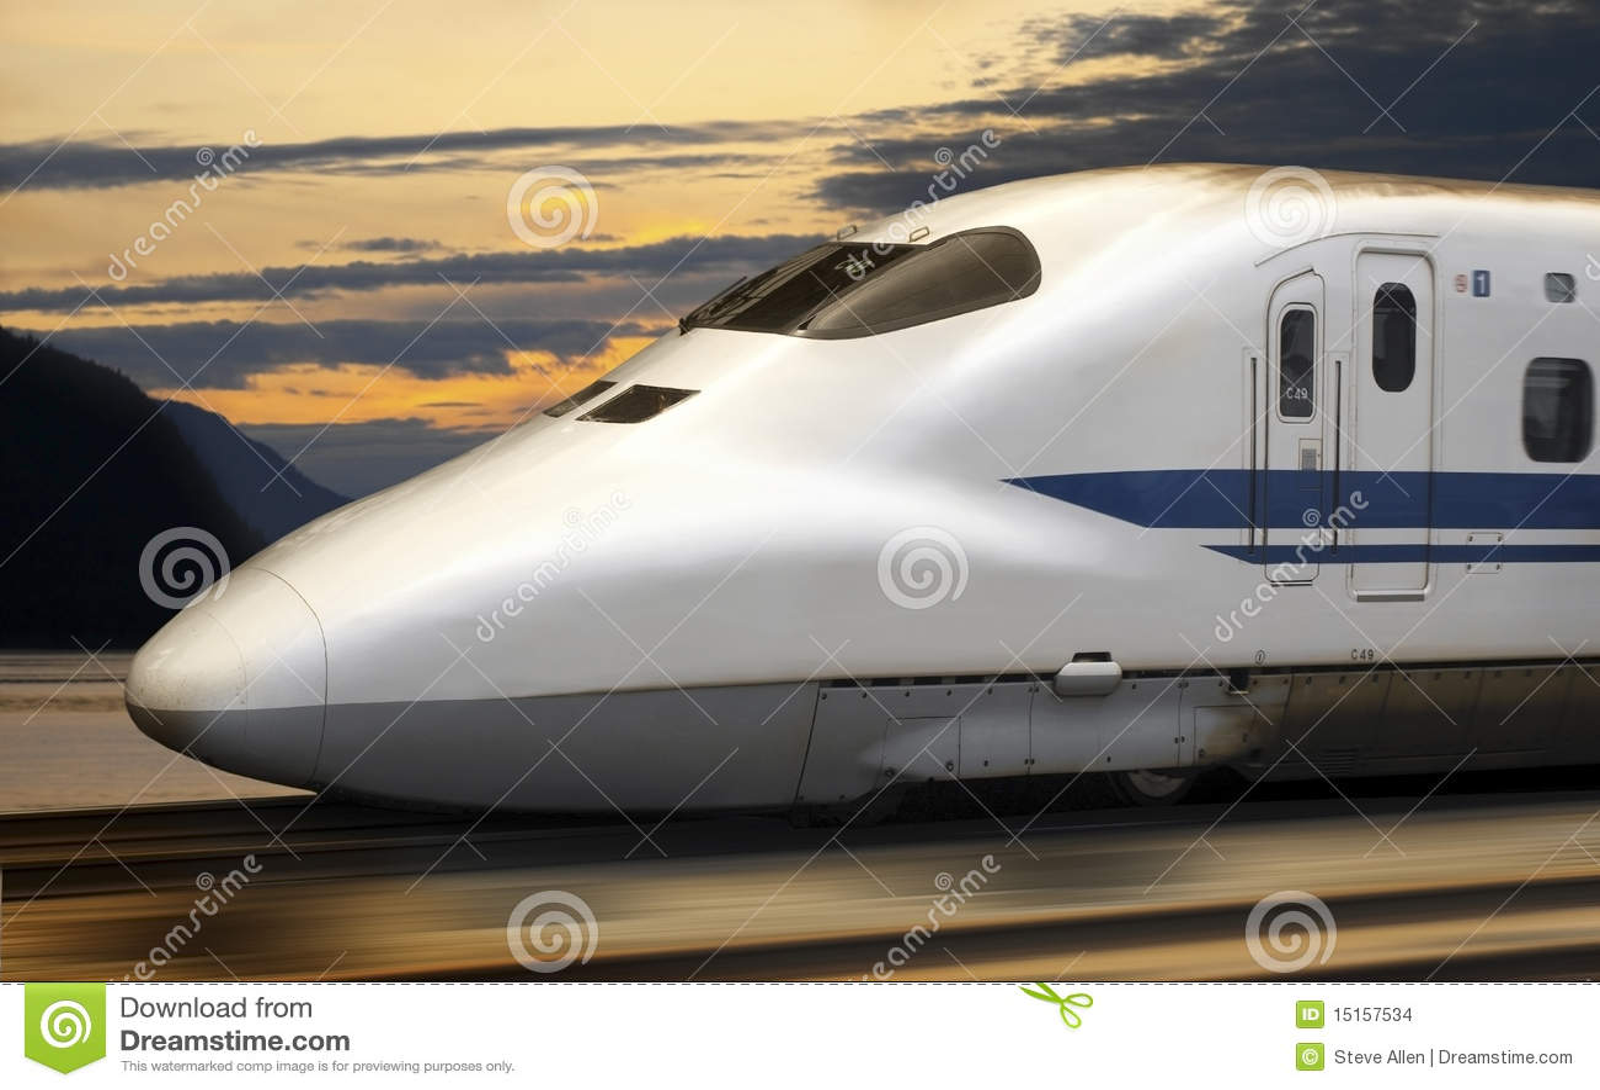 Train de remboursement in fine - Shinkansen - Japon